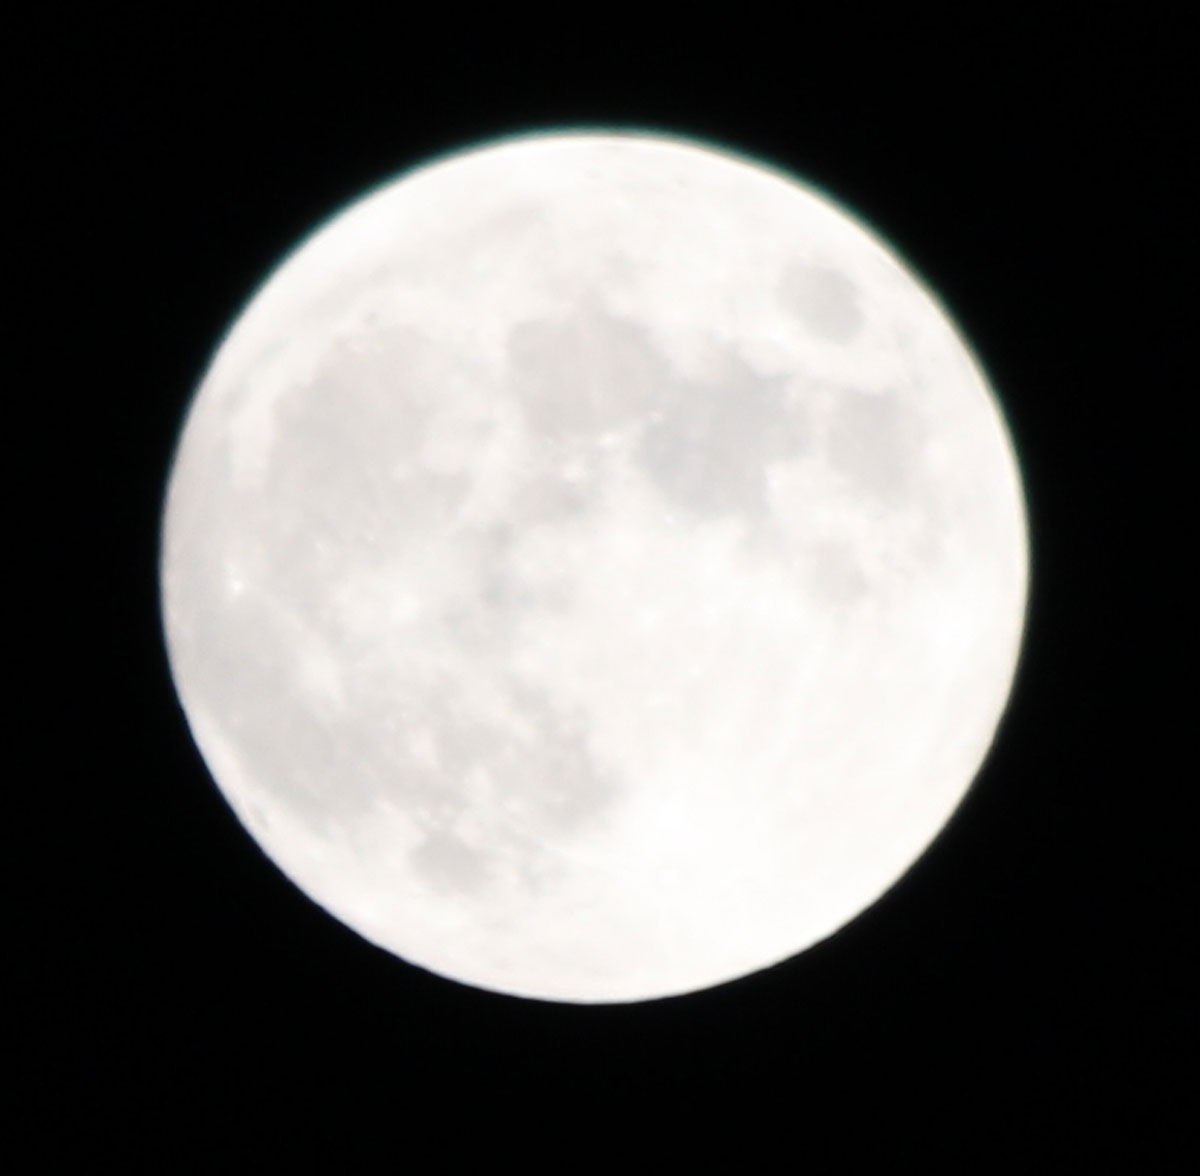 Moon Images Tonight Tonight's Moon — I've Been